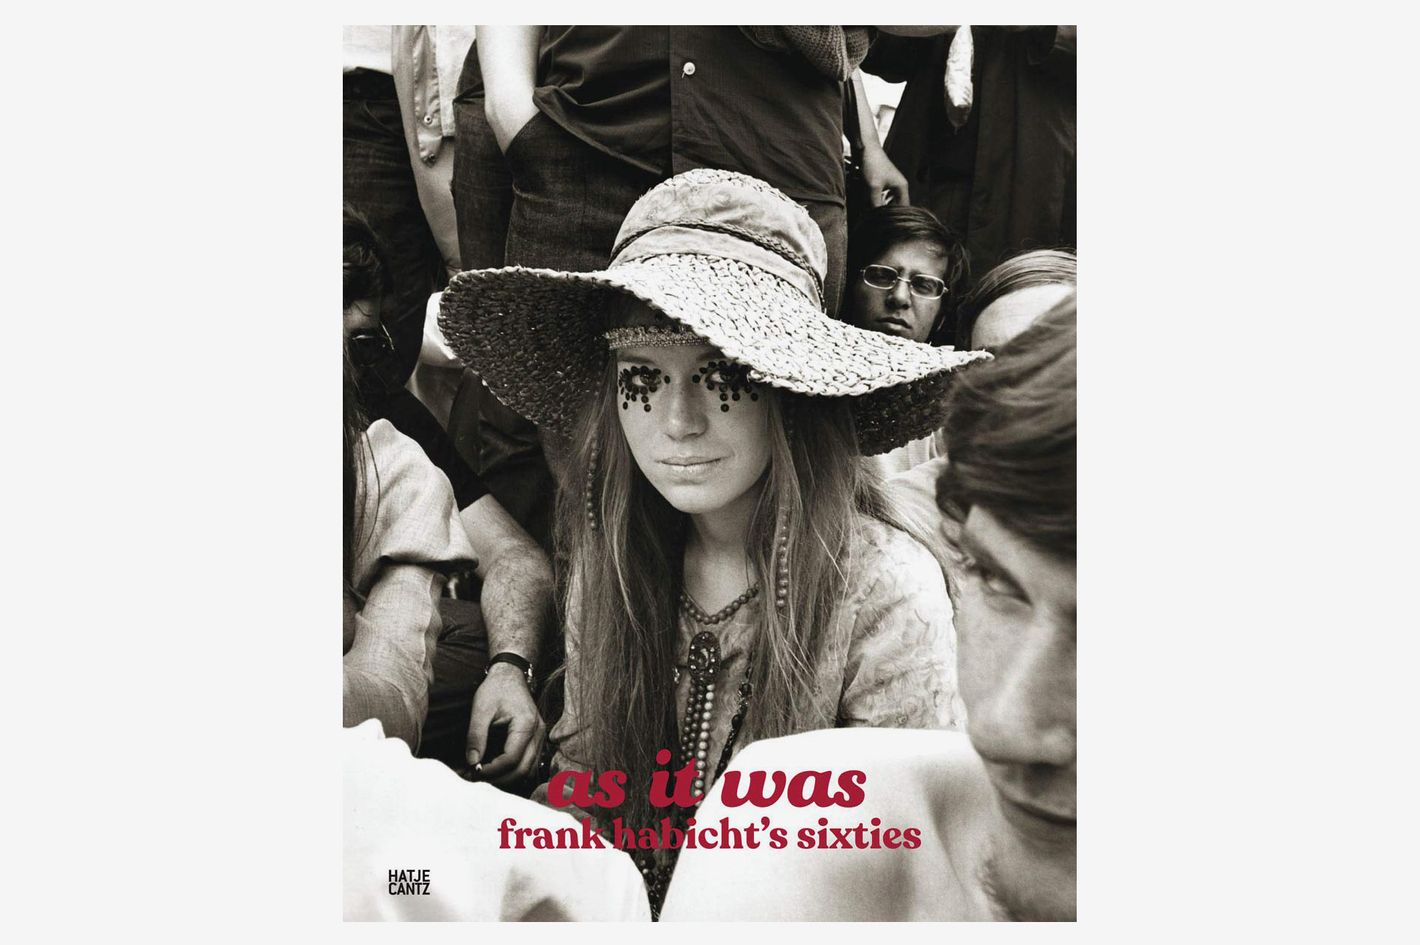 As It Was: Frank Habicht's Sixties